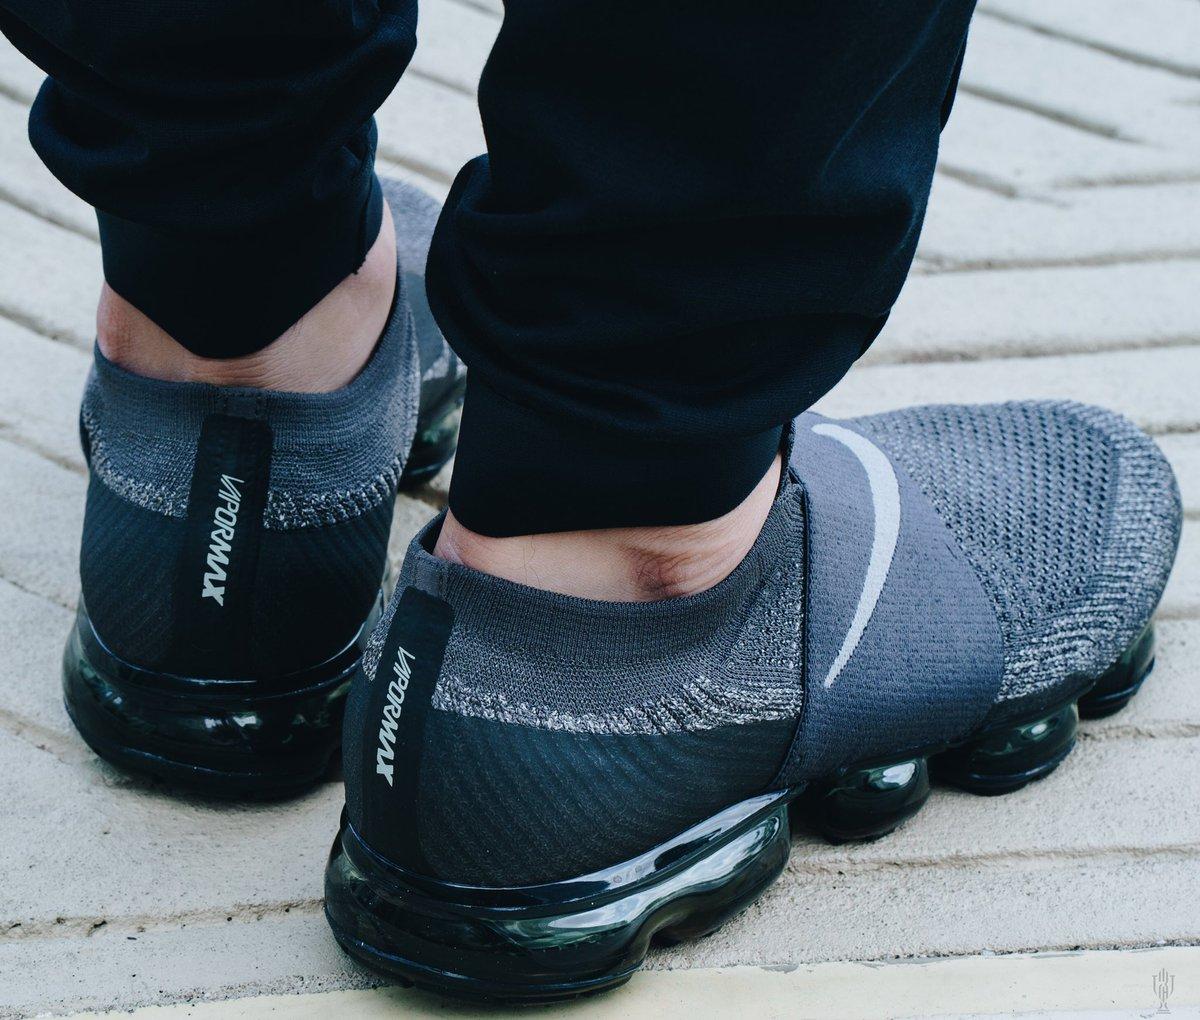 Nike Air VaporMax MOC 'Midnight Fog